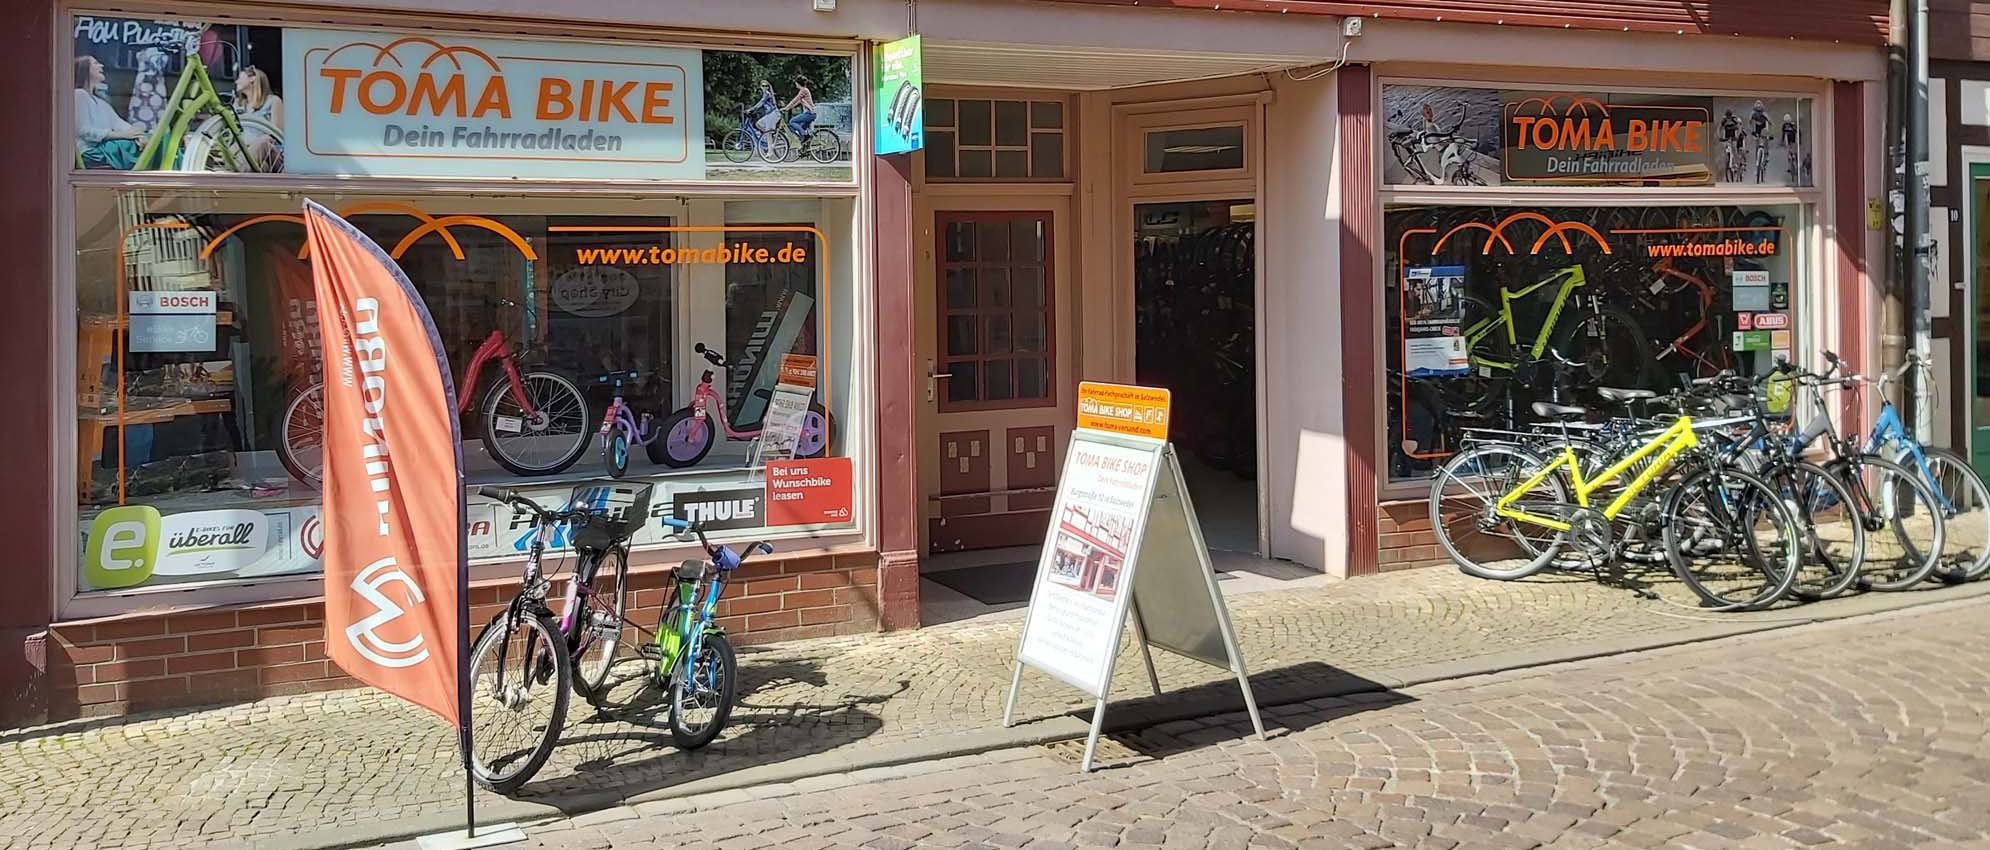 Tomabike Fahrradladen in Salzwedel